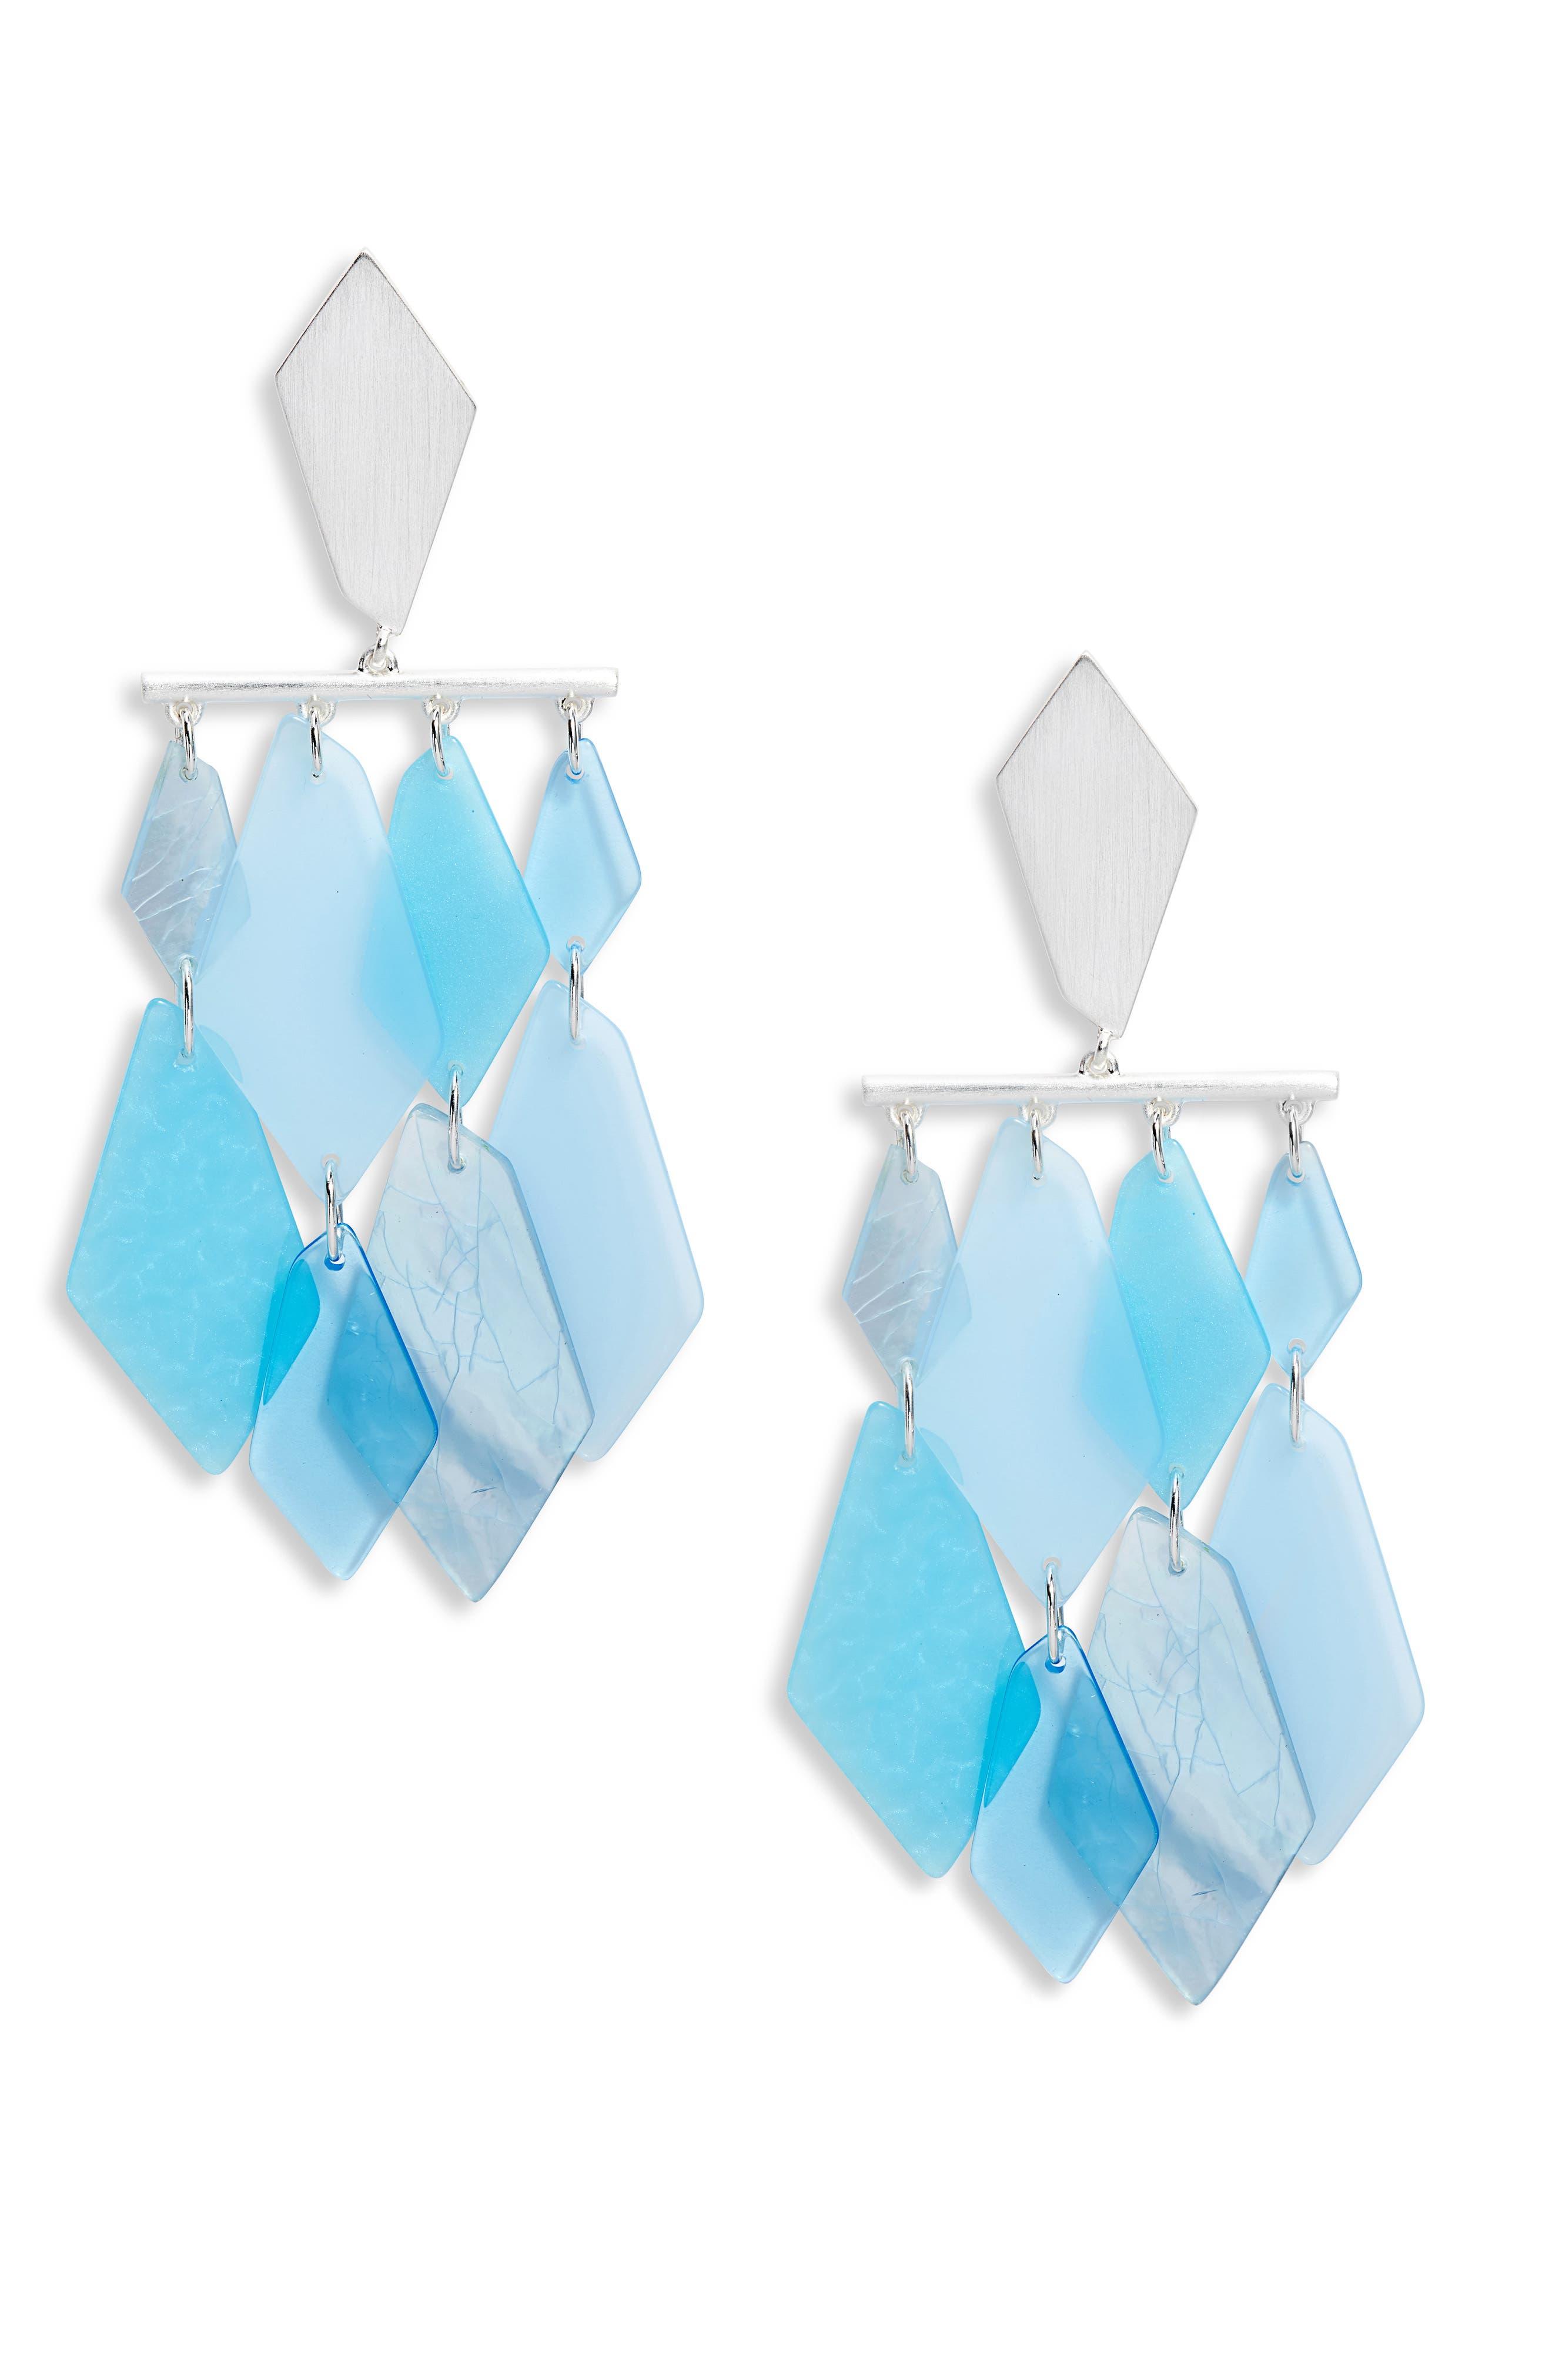 KENDRA SCOTT Hanna Earrings, Main, color, SKY BLUE MIX/ SILVER